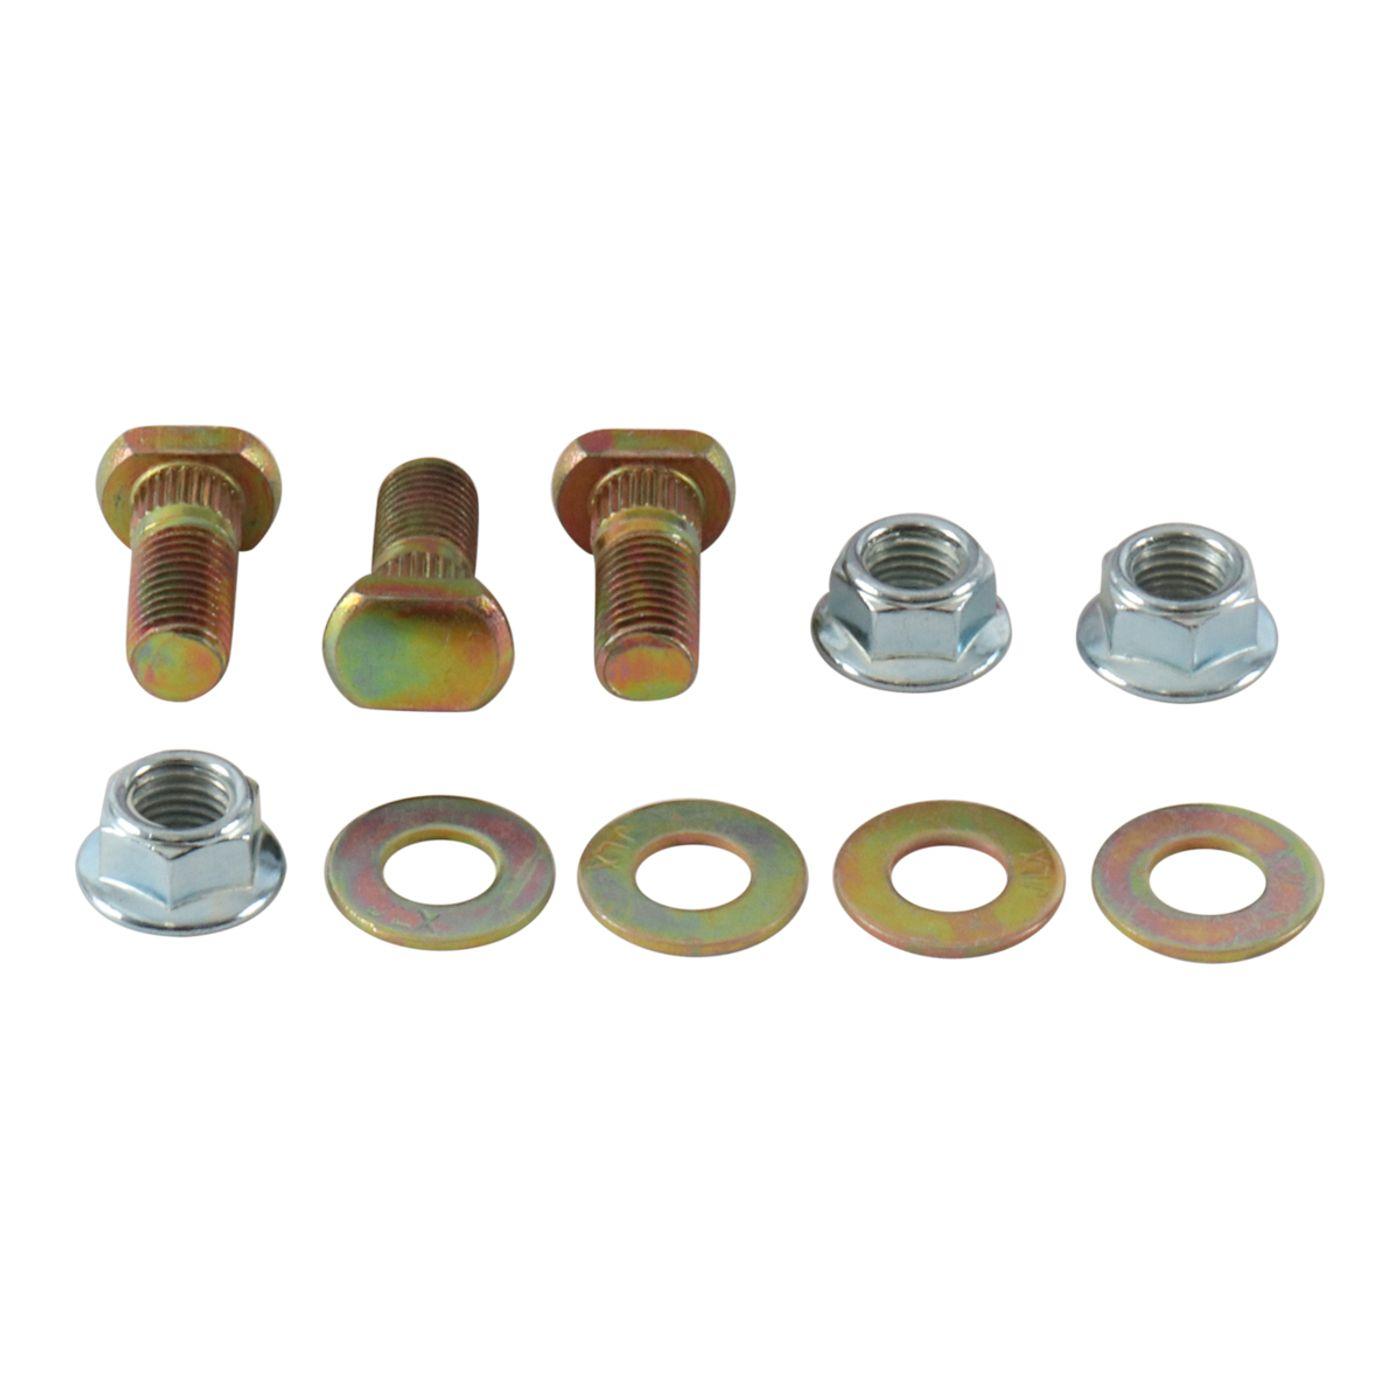 Wrp Wheel Stud & Nut Kits - WRP851030 image